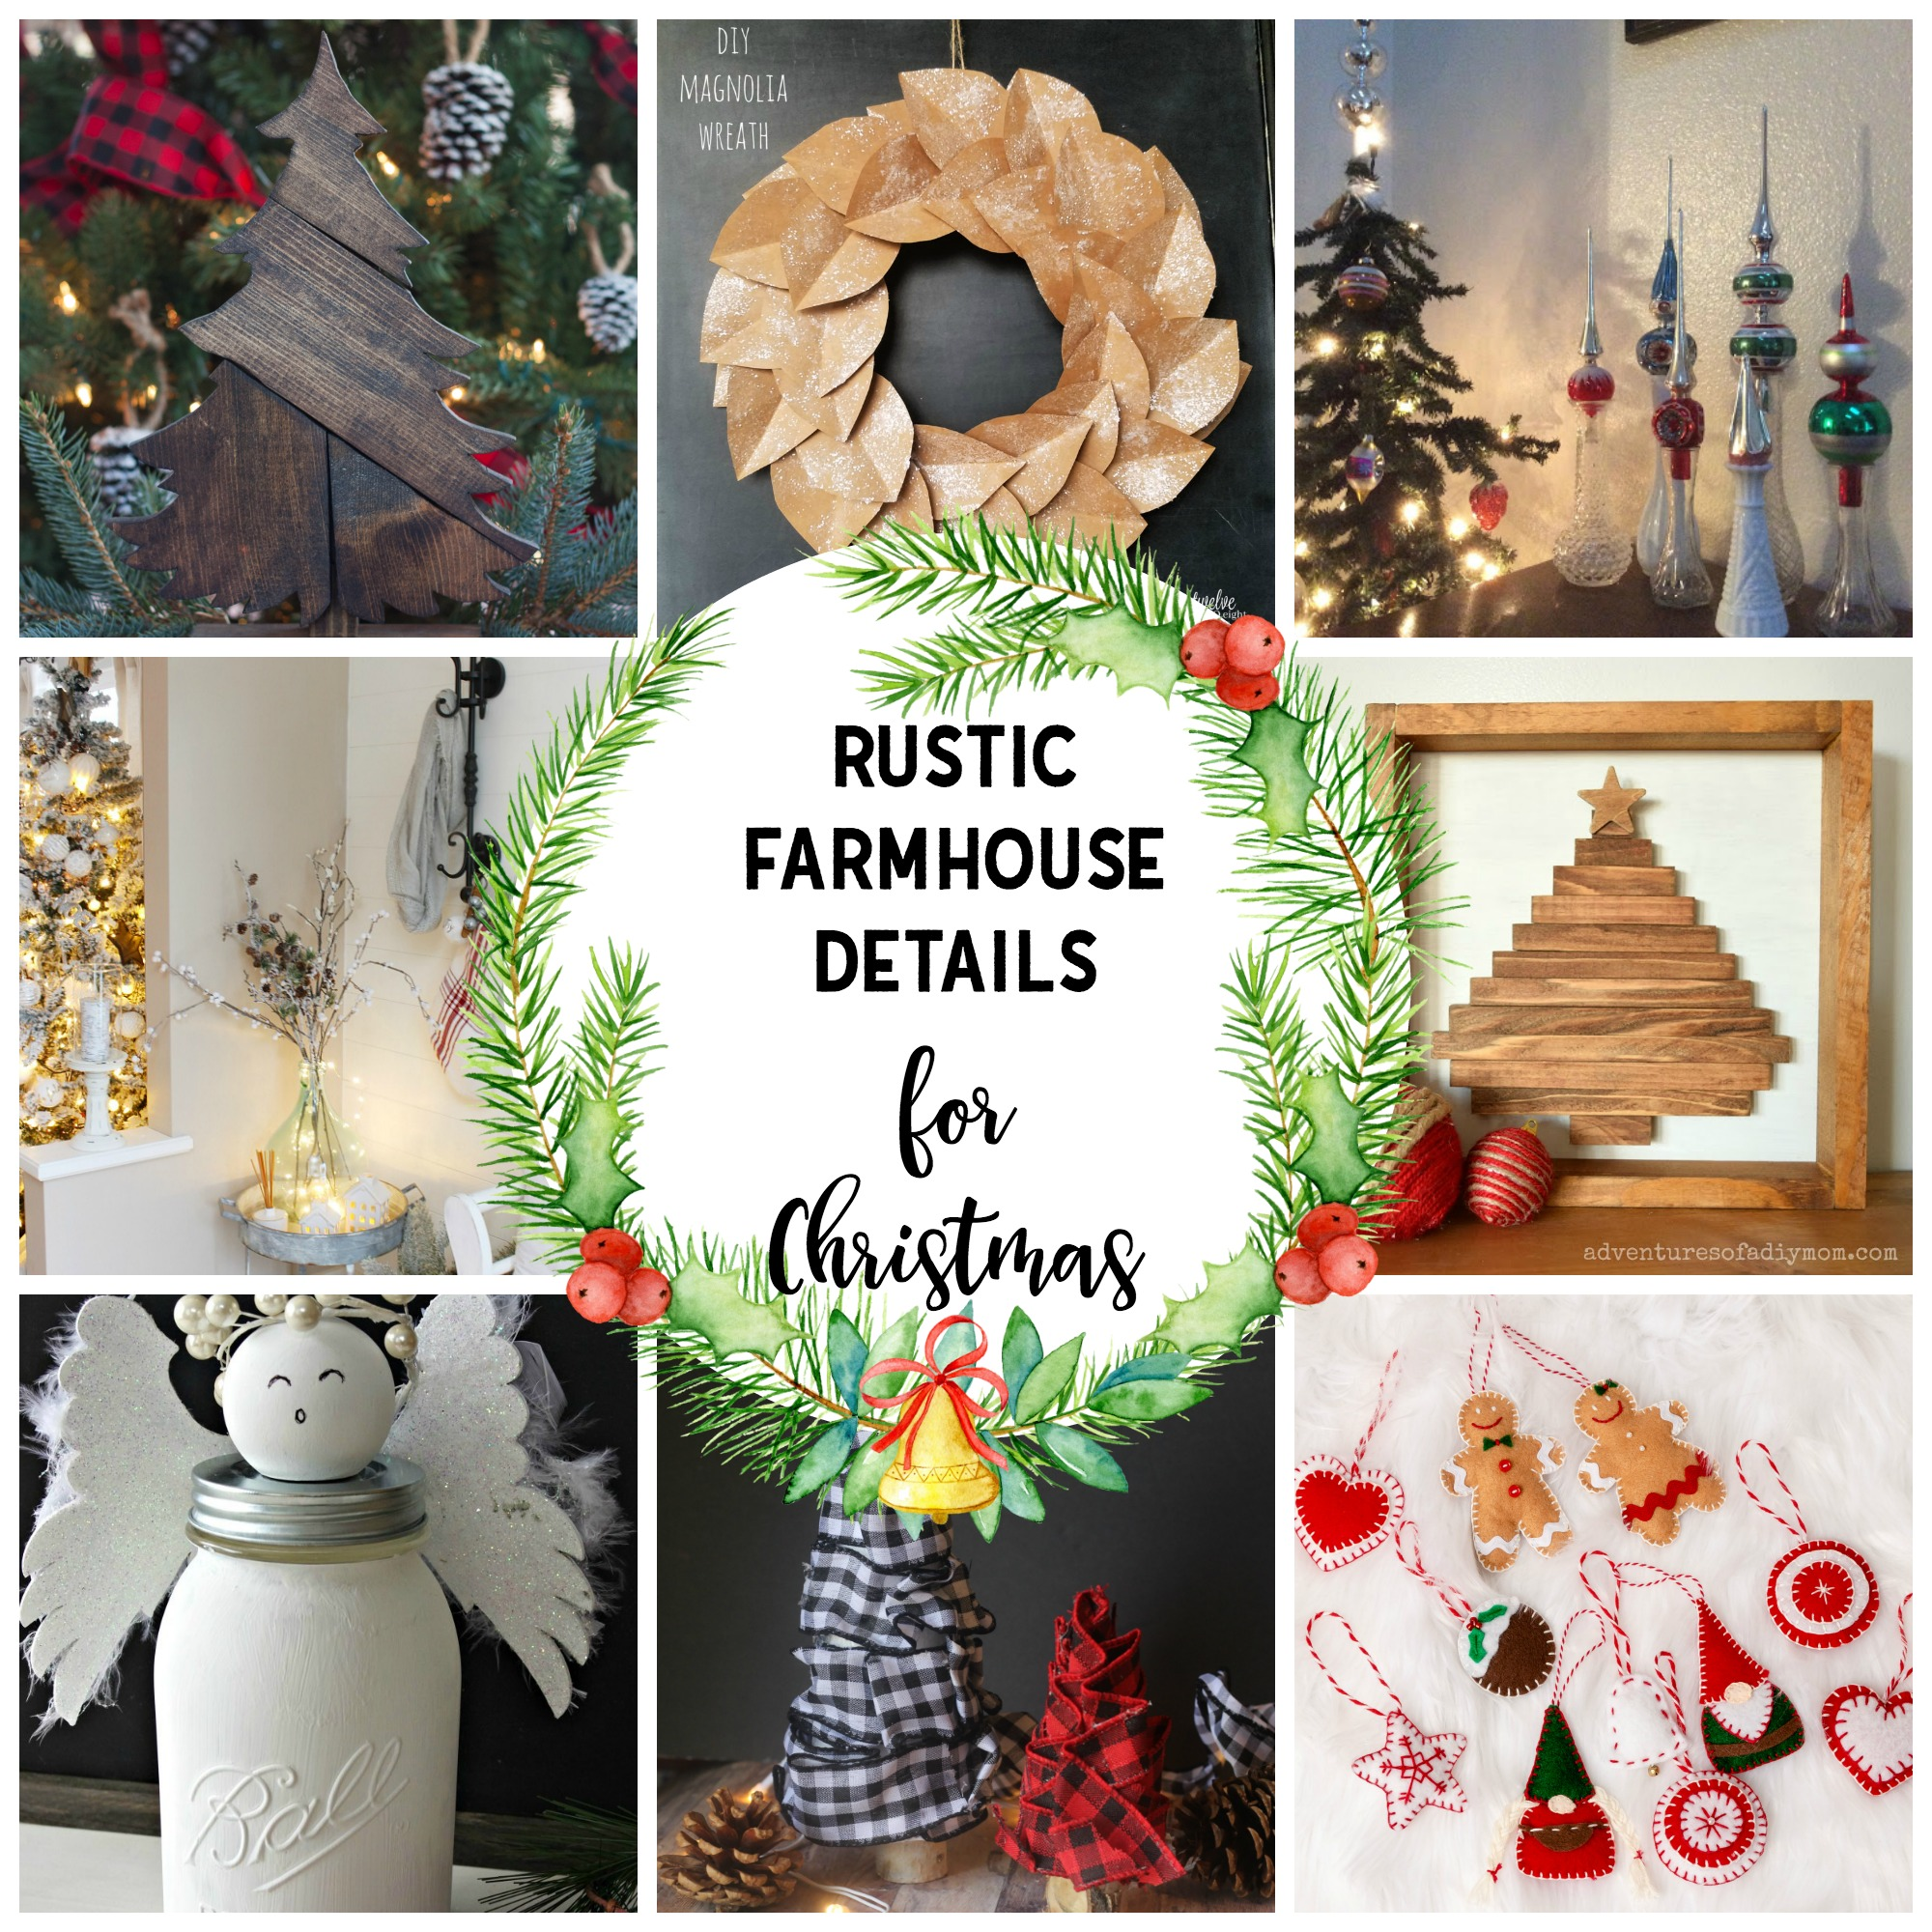 Rustic Farmhouse Details for Christmas